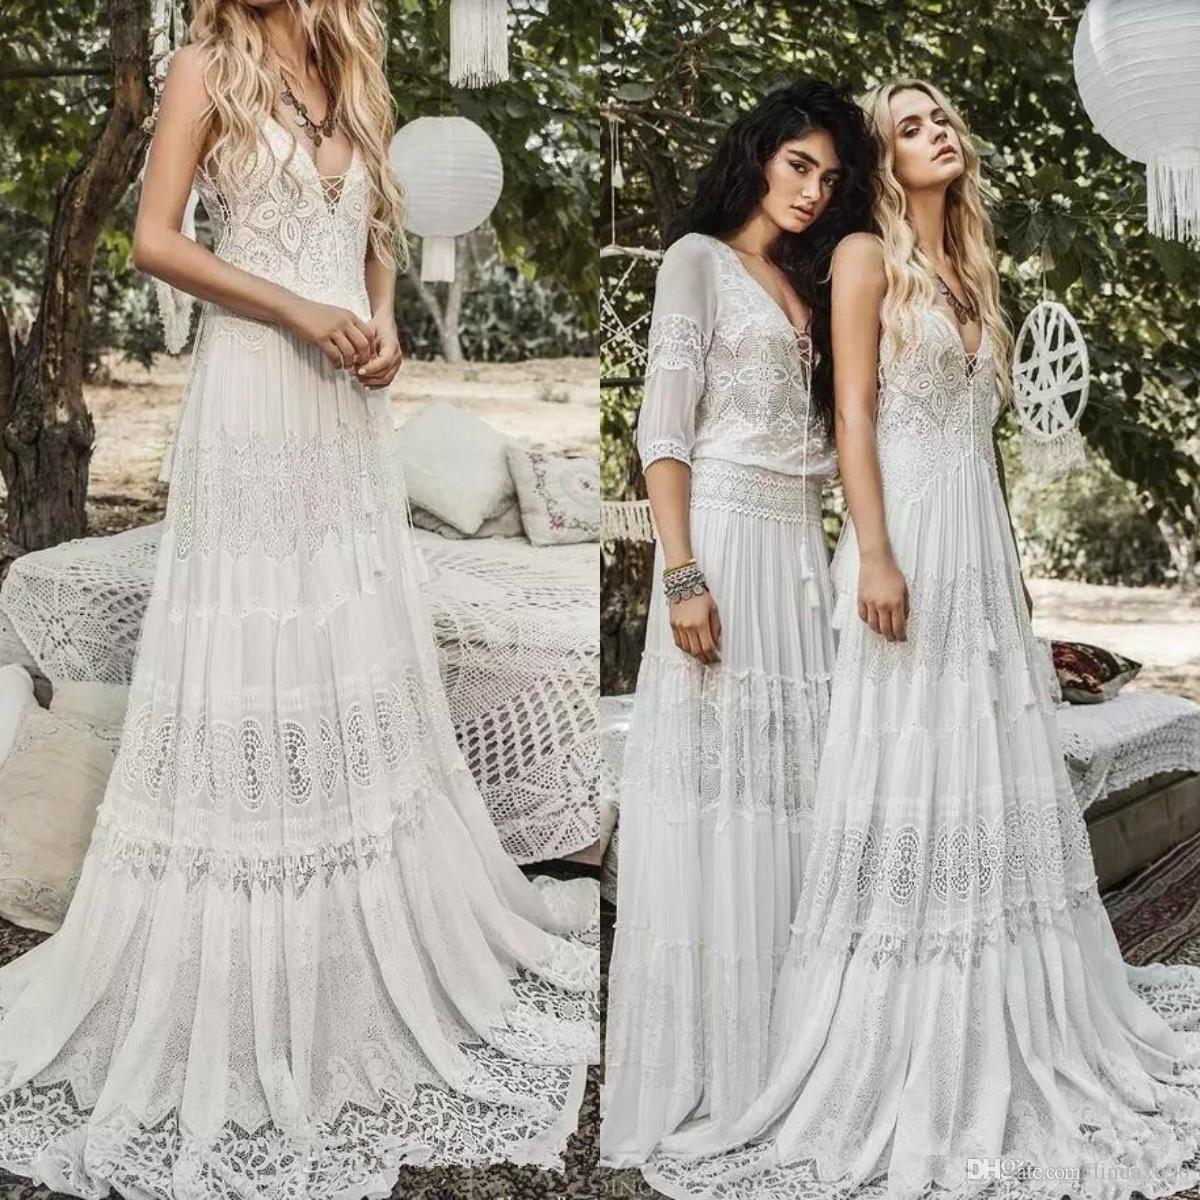 Discount Bohemian Flowy Chiffon Beach Wedding Dresses V Neck Cheap Boho Bridal Gowns A Line Sexy Lace Appliqued Wedding Dress Vestidos De Novia Wedding Dresses Cheap Online Wedding Dresses For Bride From